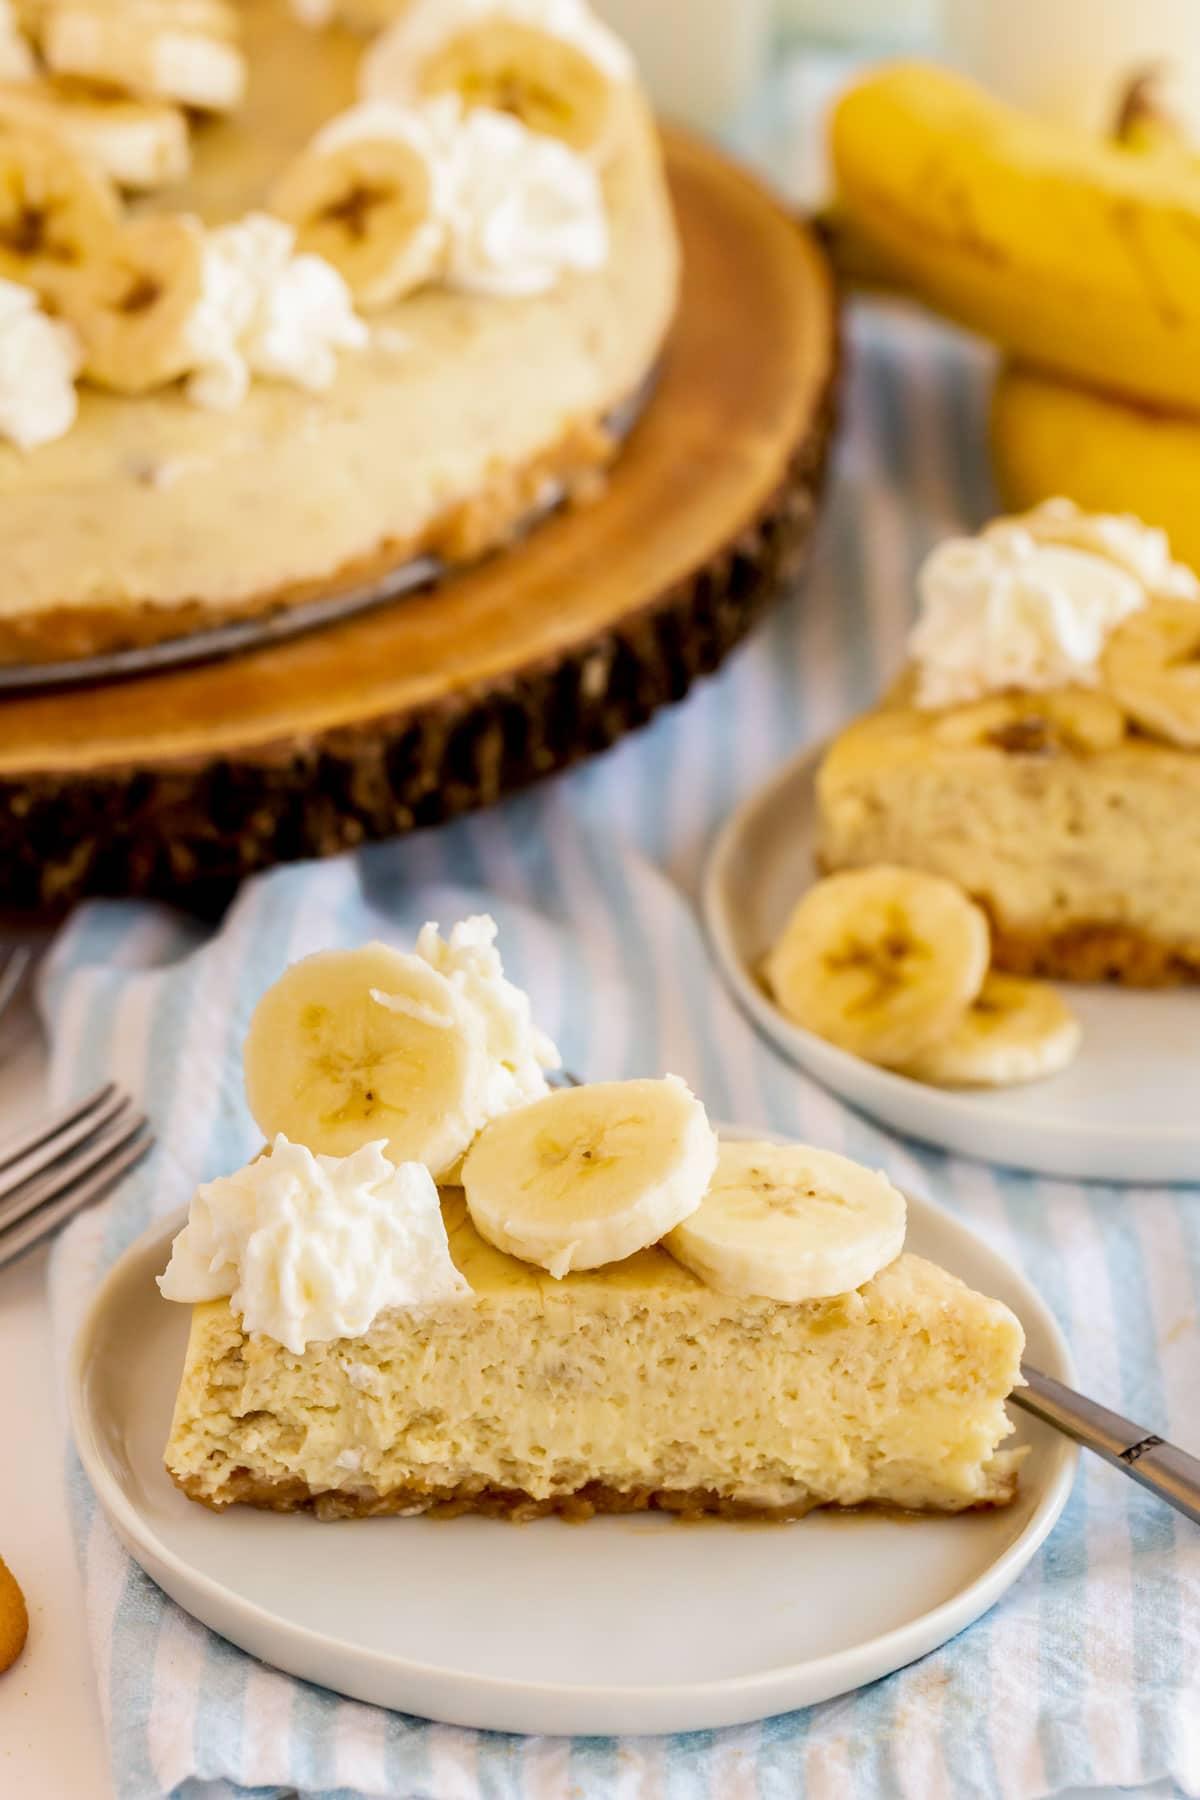 banana cream cheesecake slice on a plate